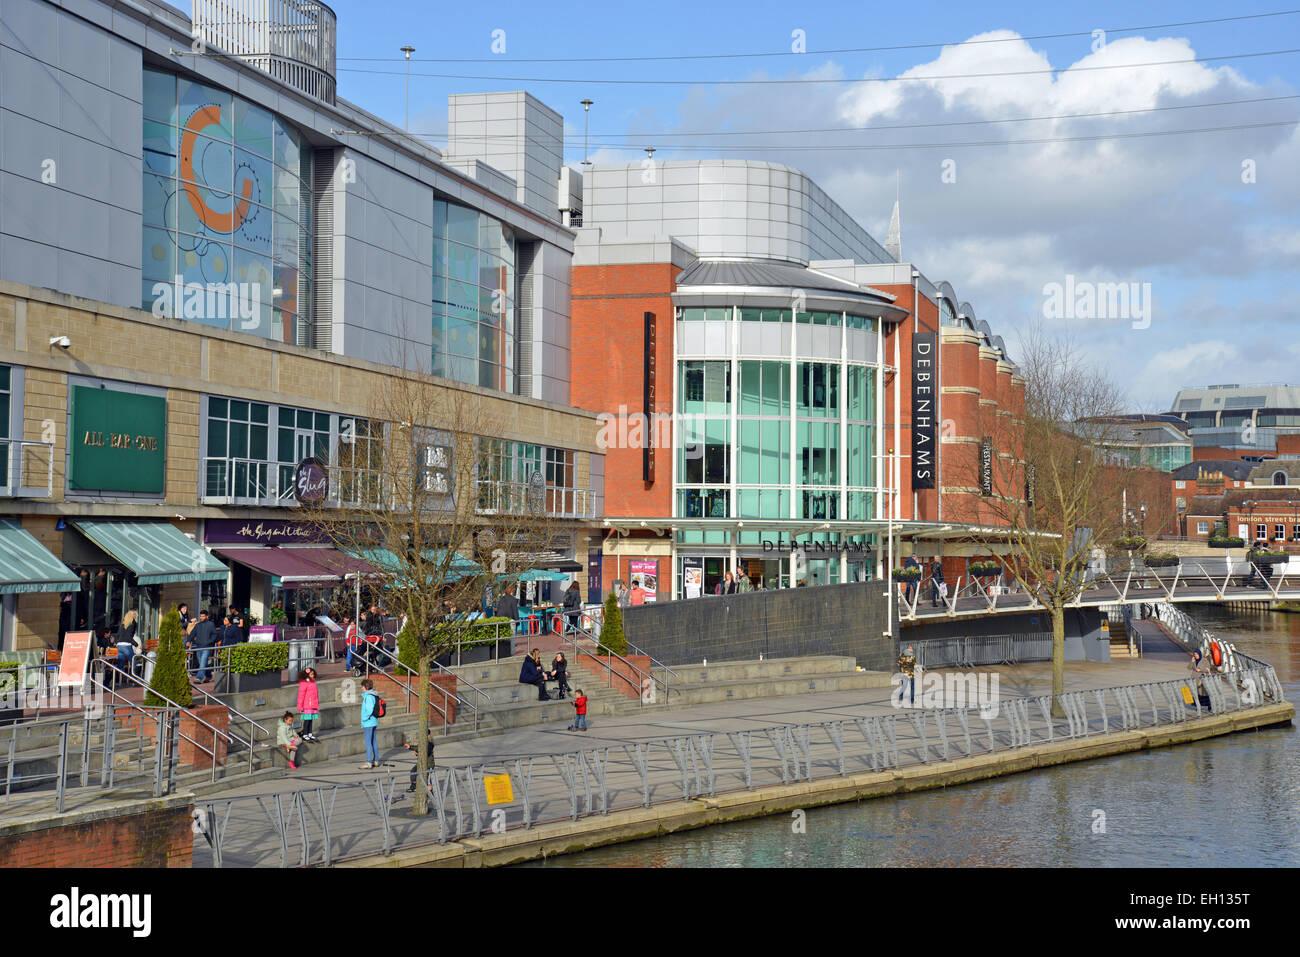 Riverside Level showing Debenhams Department Store, The Oracle, Reading, Berkshire, England, United Kingdom - Stock Image